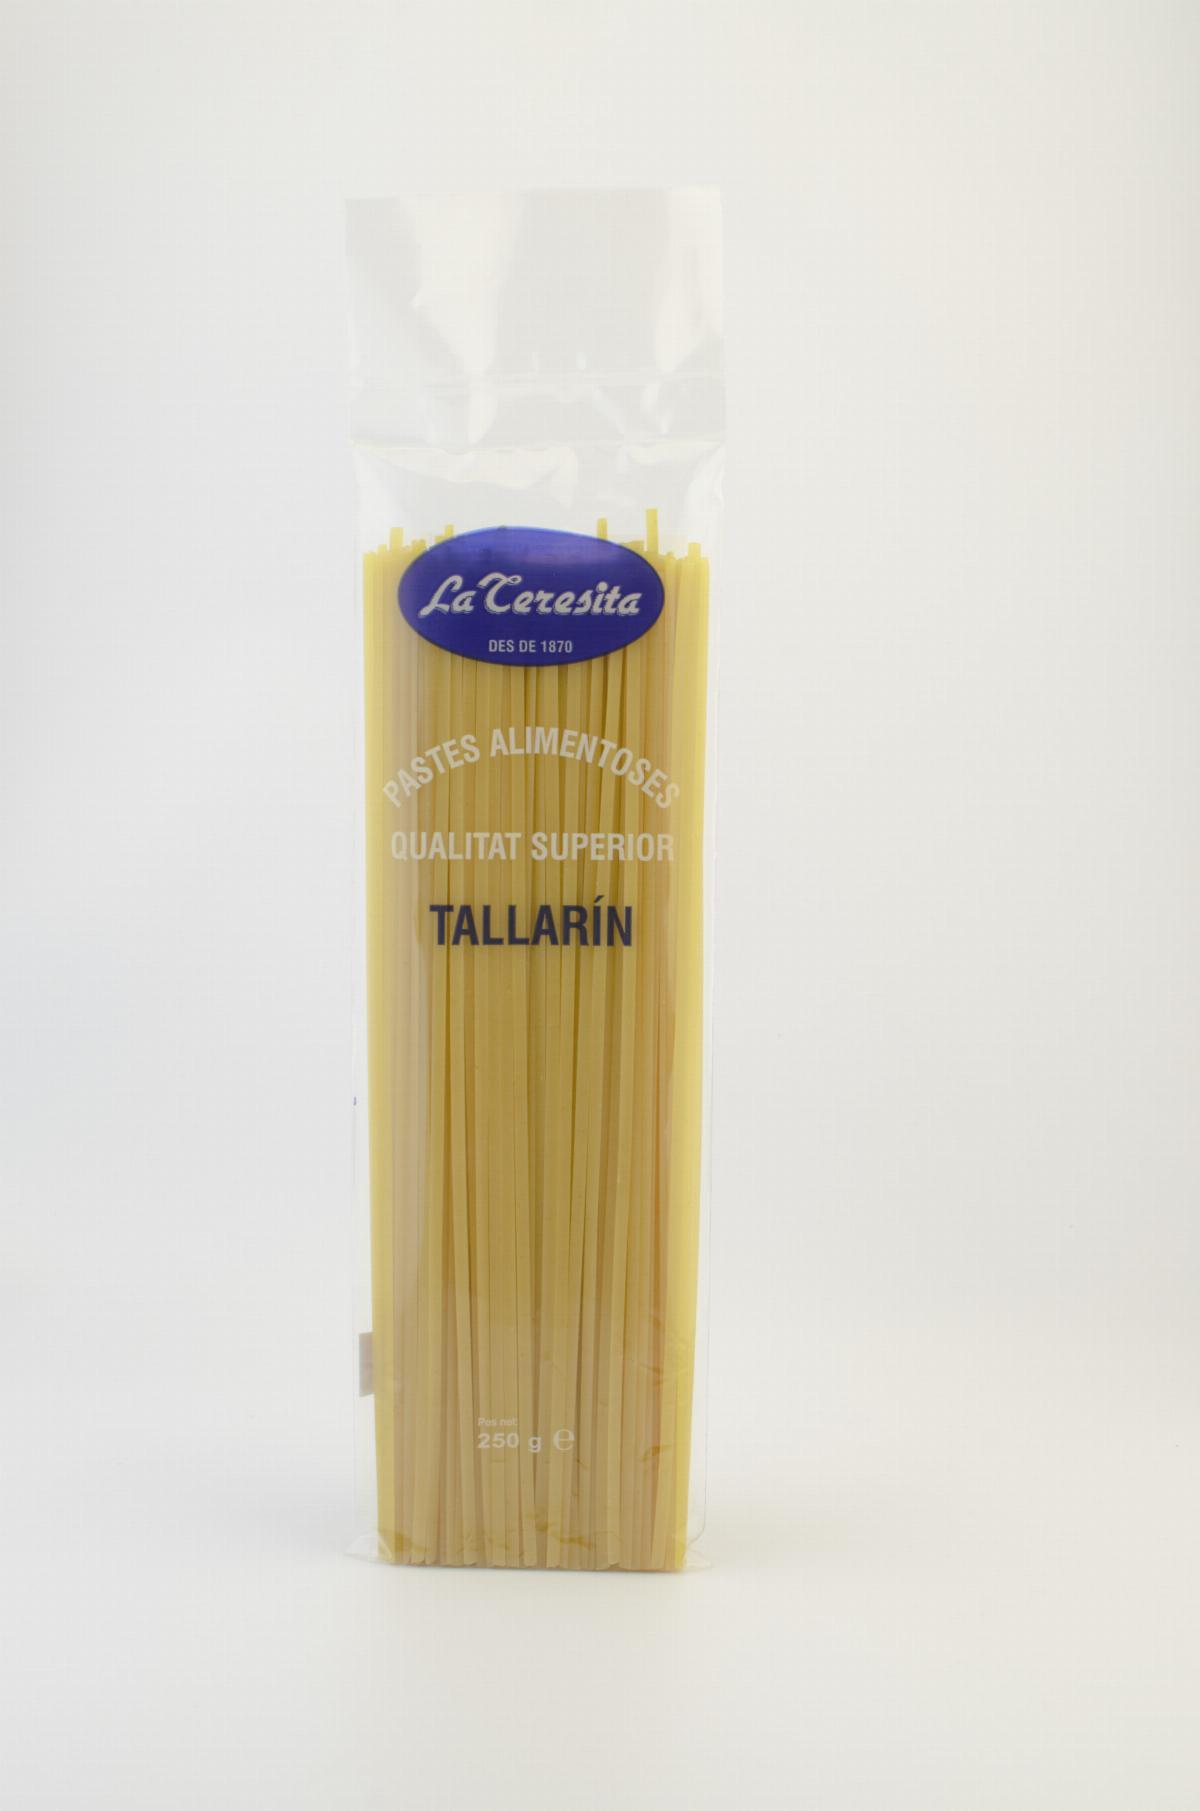 Pasta - Pasta Tradicional Tallarines La Teresita 250g - Mestral Cambrils